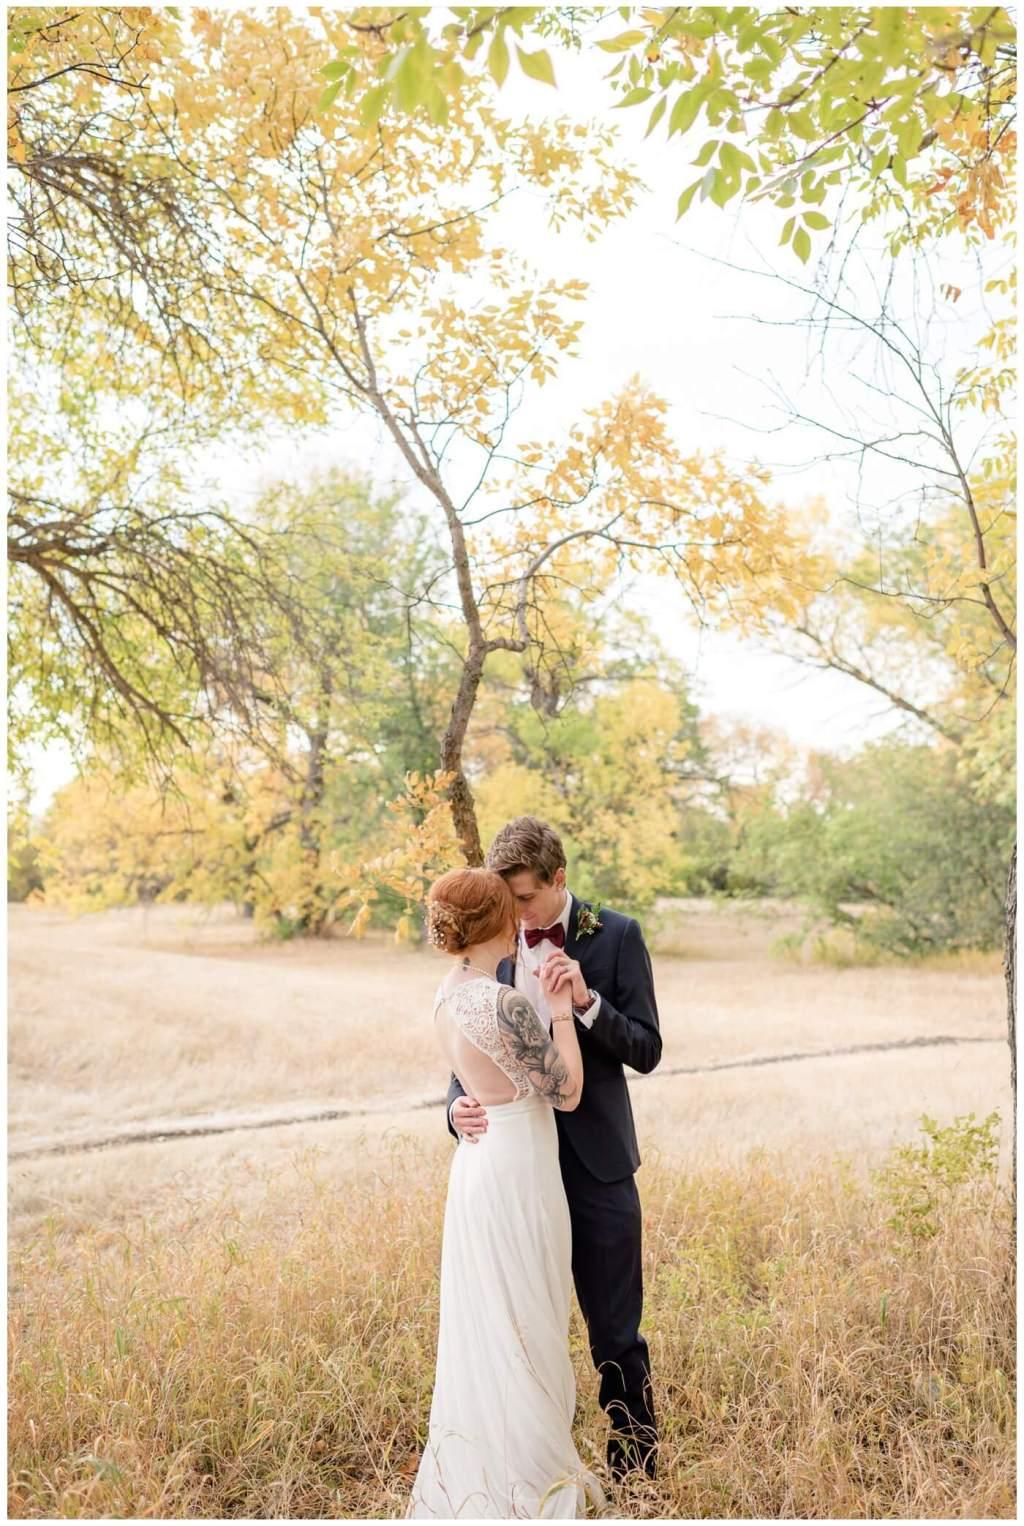 Regina Wedding Photographer - Cole-Alisha - Fall Wedding - Tall Grass - Dancing